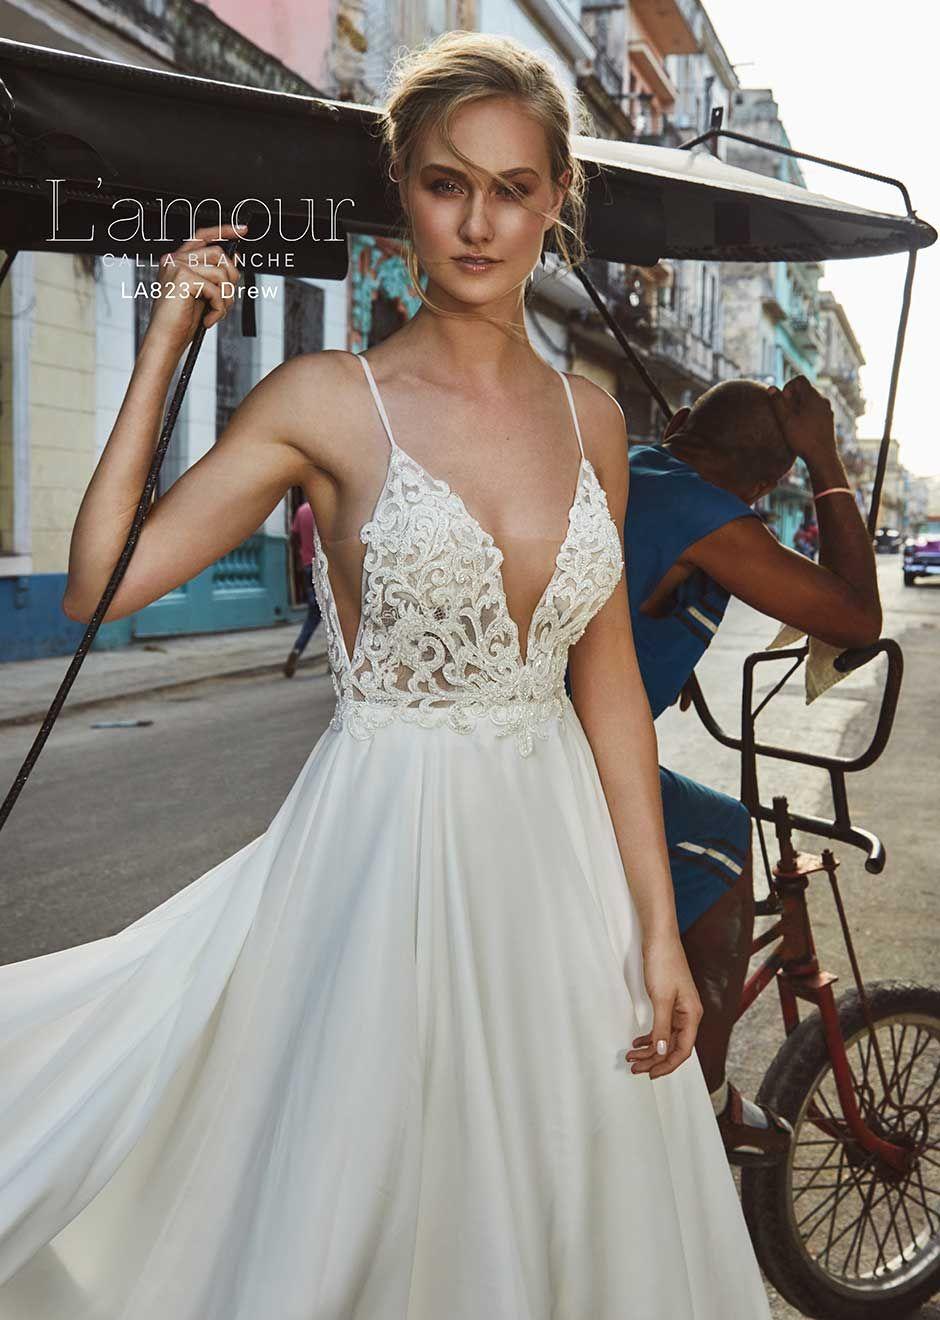 2ab0f14b01c91 L'Amour Drew   L'Amour by Calla Blanche   Wedding dresses, Dresses ...